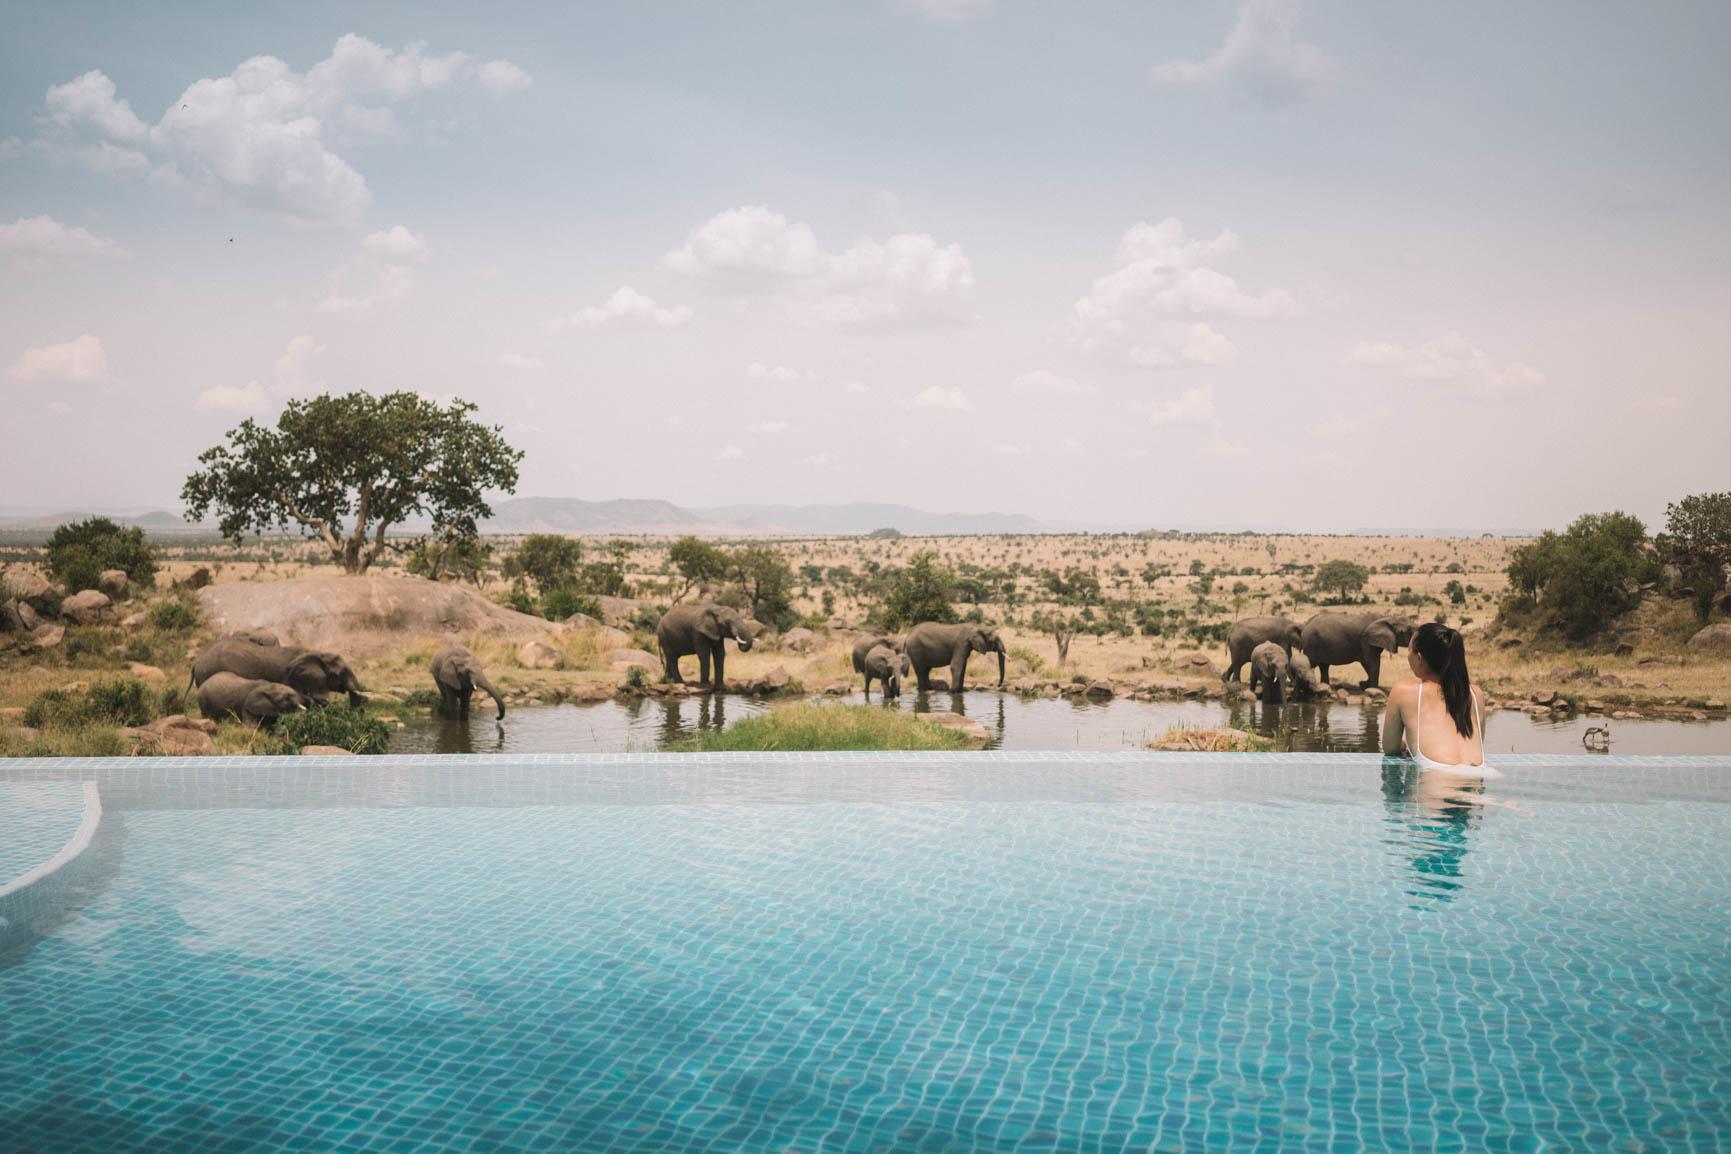 African Safari Packing List - what to wear on safari